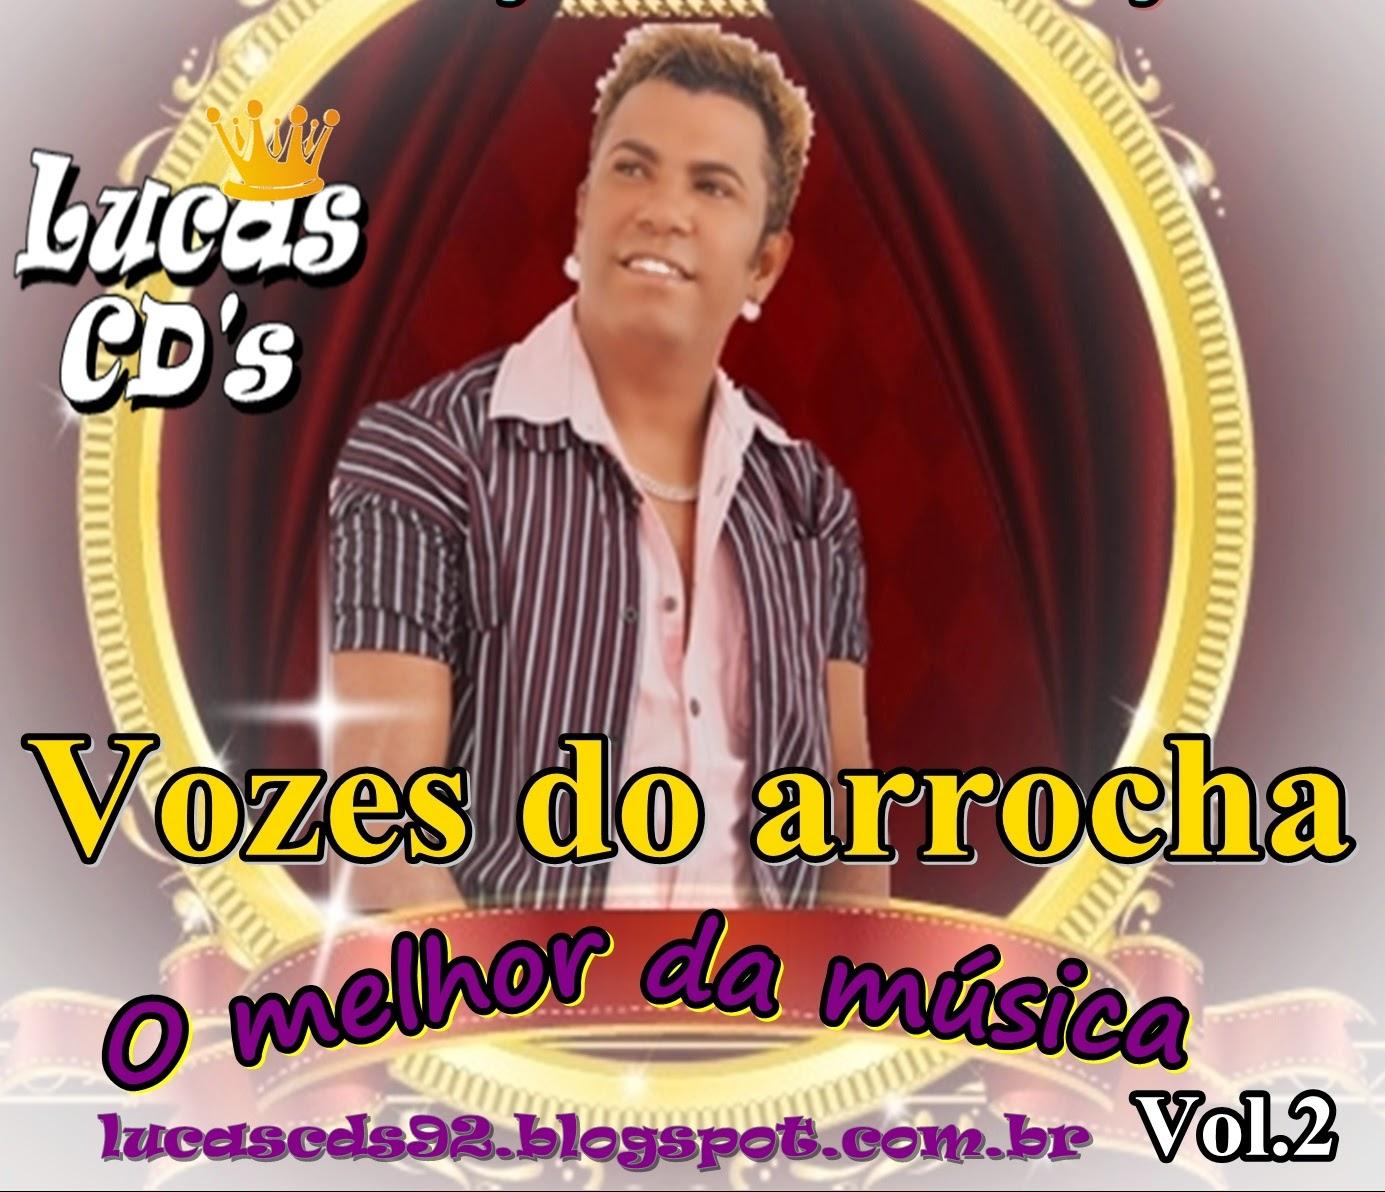 Lucas CD's: Vozes Do Arrocha CD Modelo Silvano Salles Vol